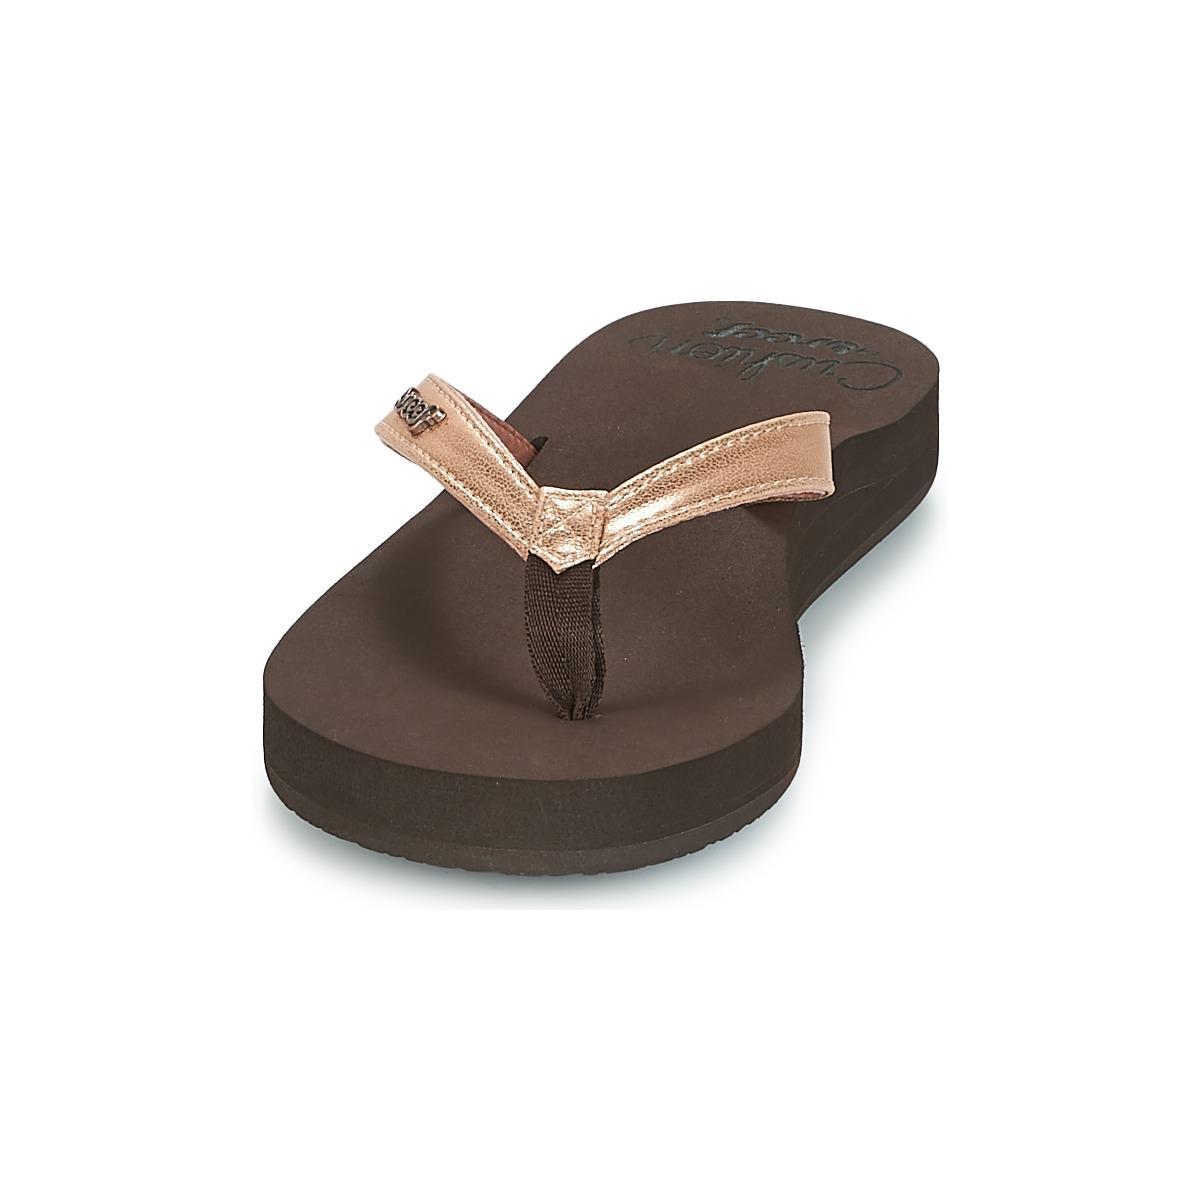 ddee684ad7d Reef - Brown Cushion Luna Flip Flops   Sandals (shoes) - Lyst. View  fullscreen